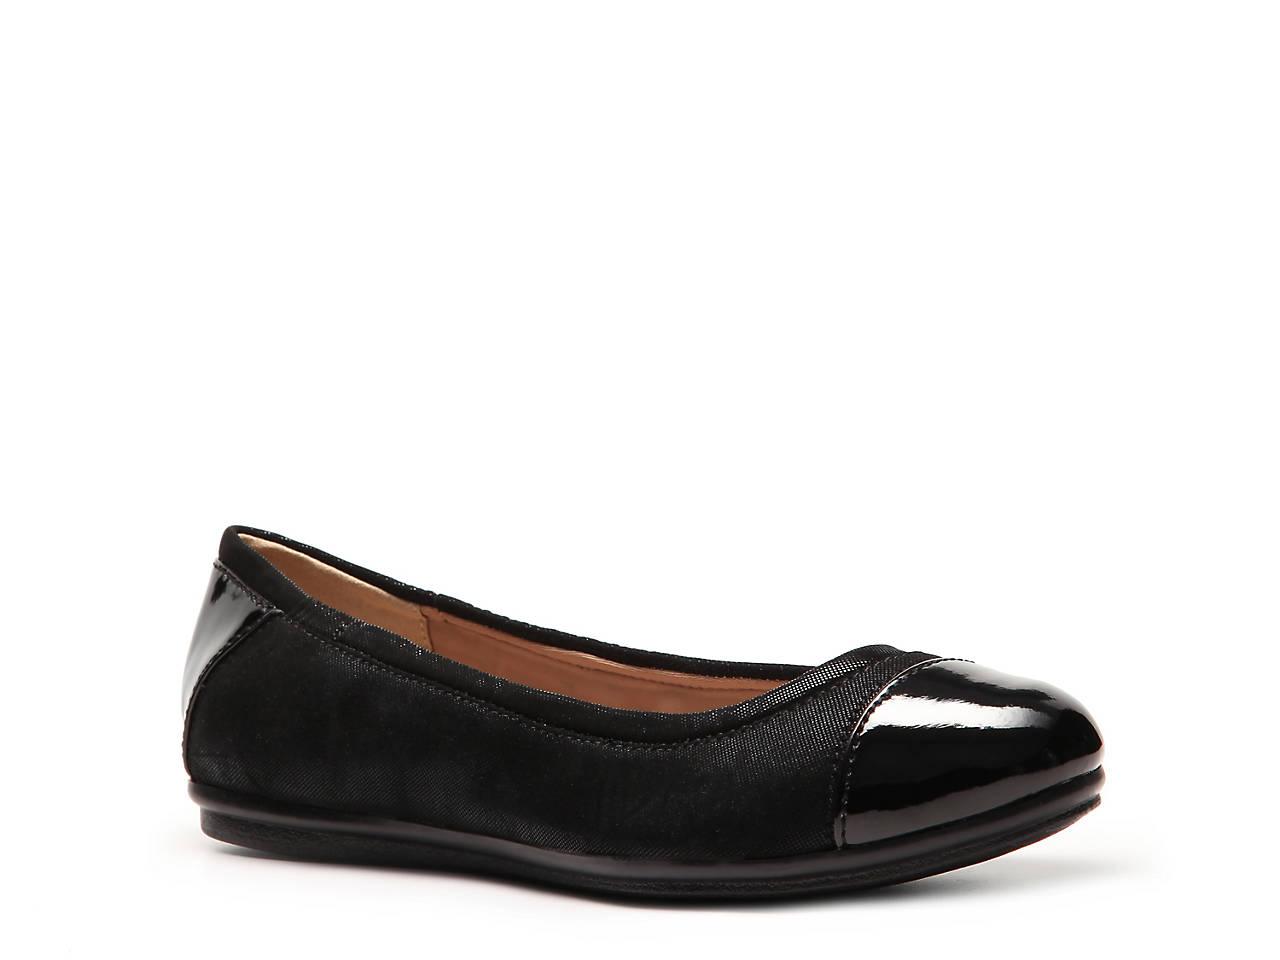 21b95e3170 Easy Spirit Gessica Ballet Flat Women's Shoes | DSW